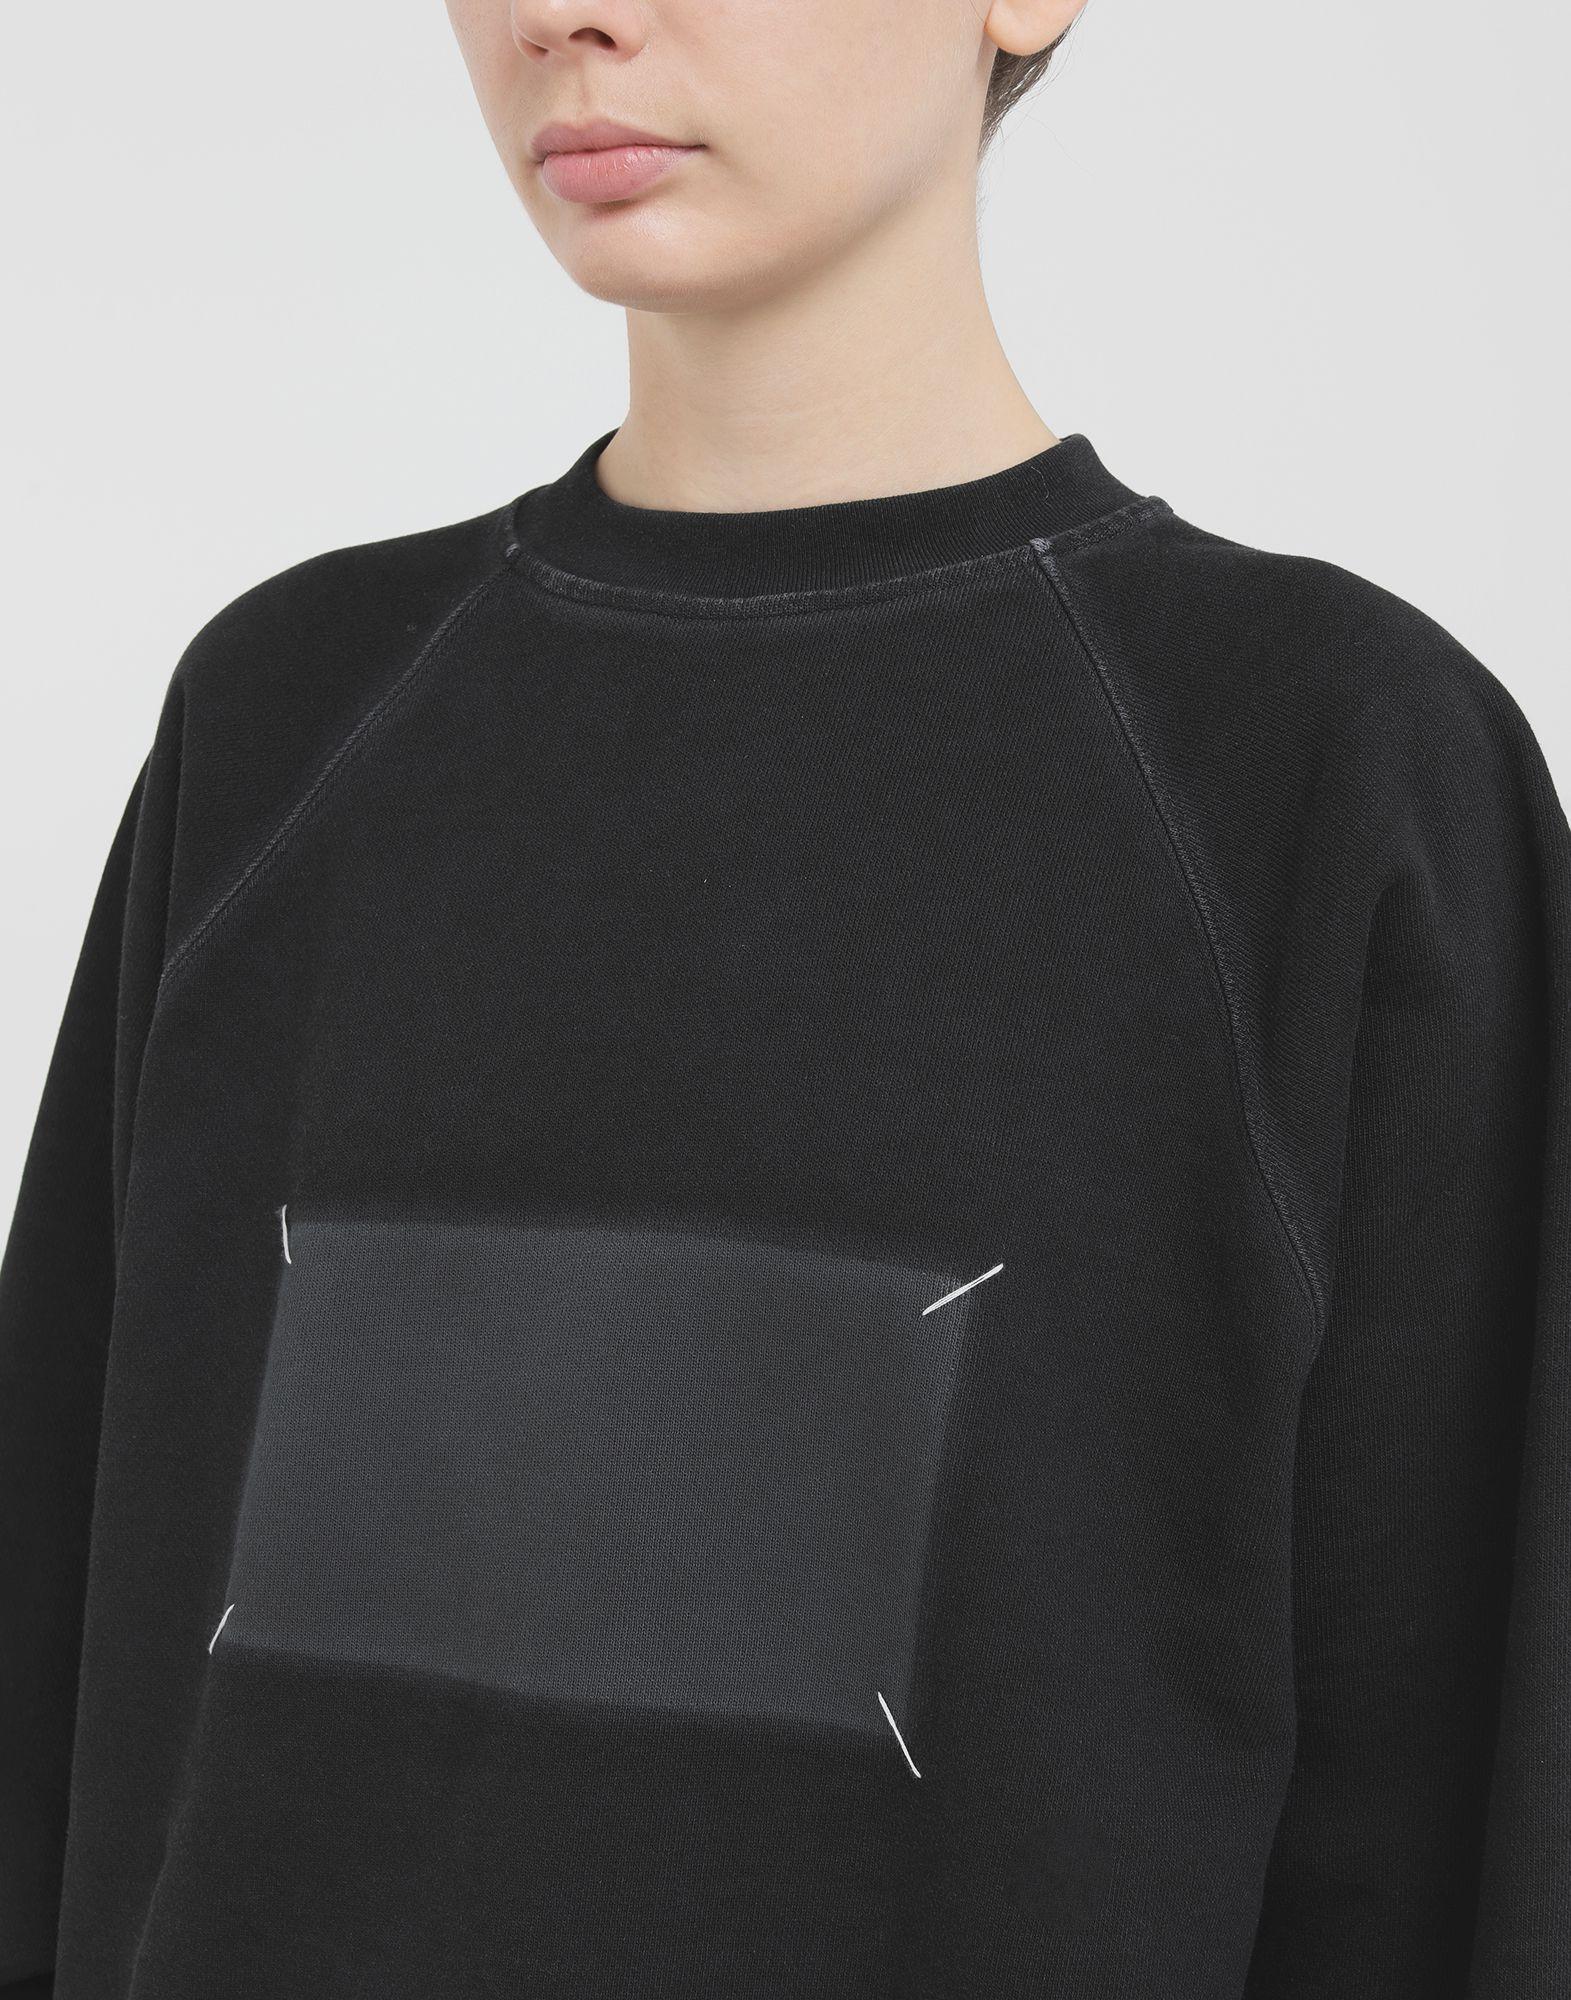 MAISON MARGIELA Sweatshirt Woman a